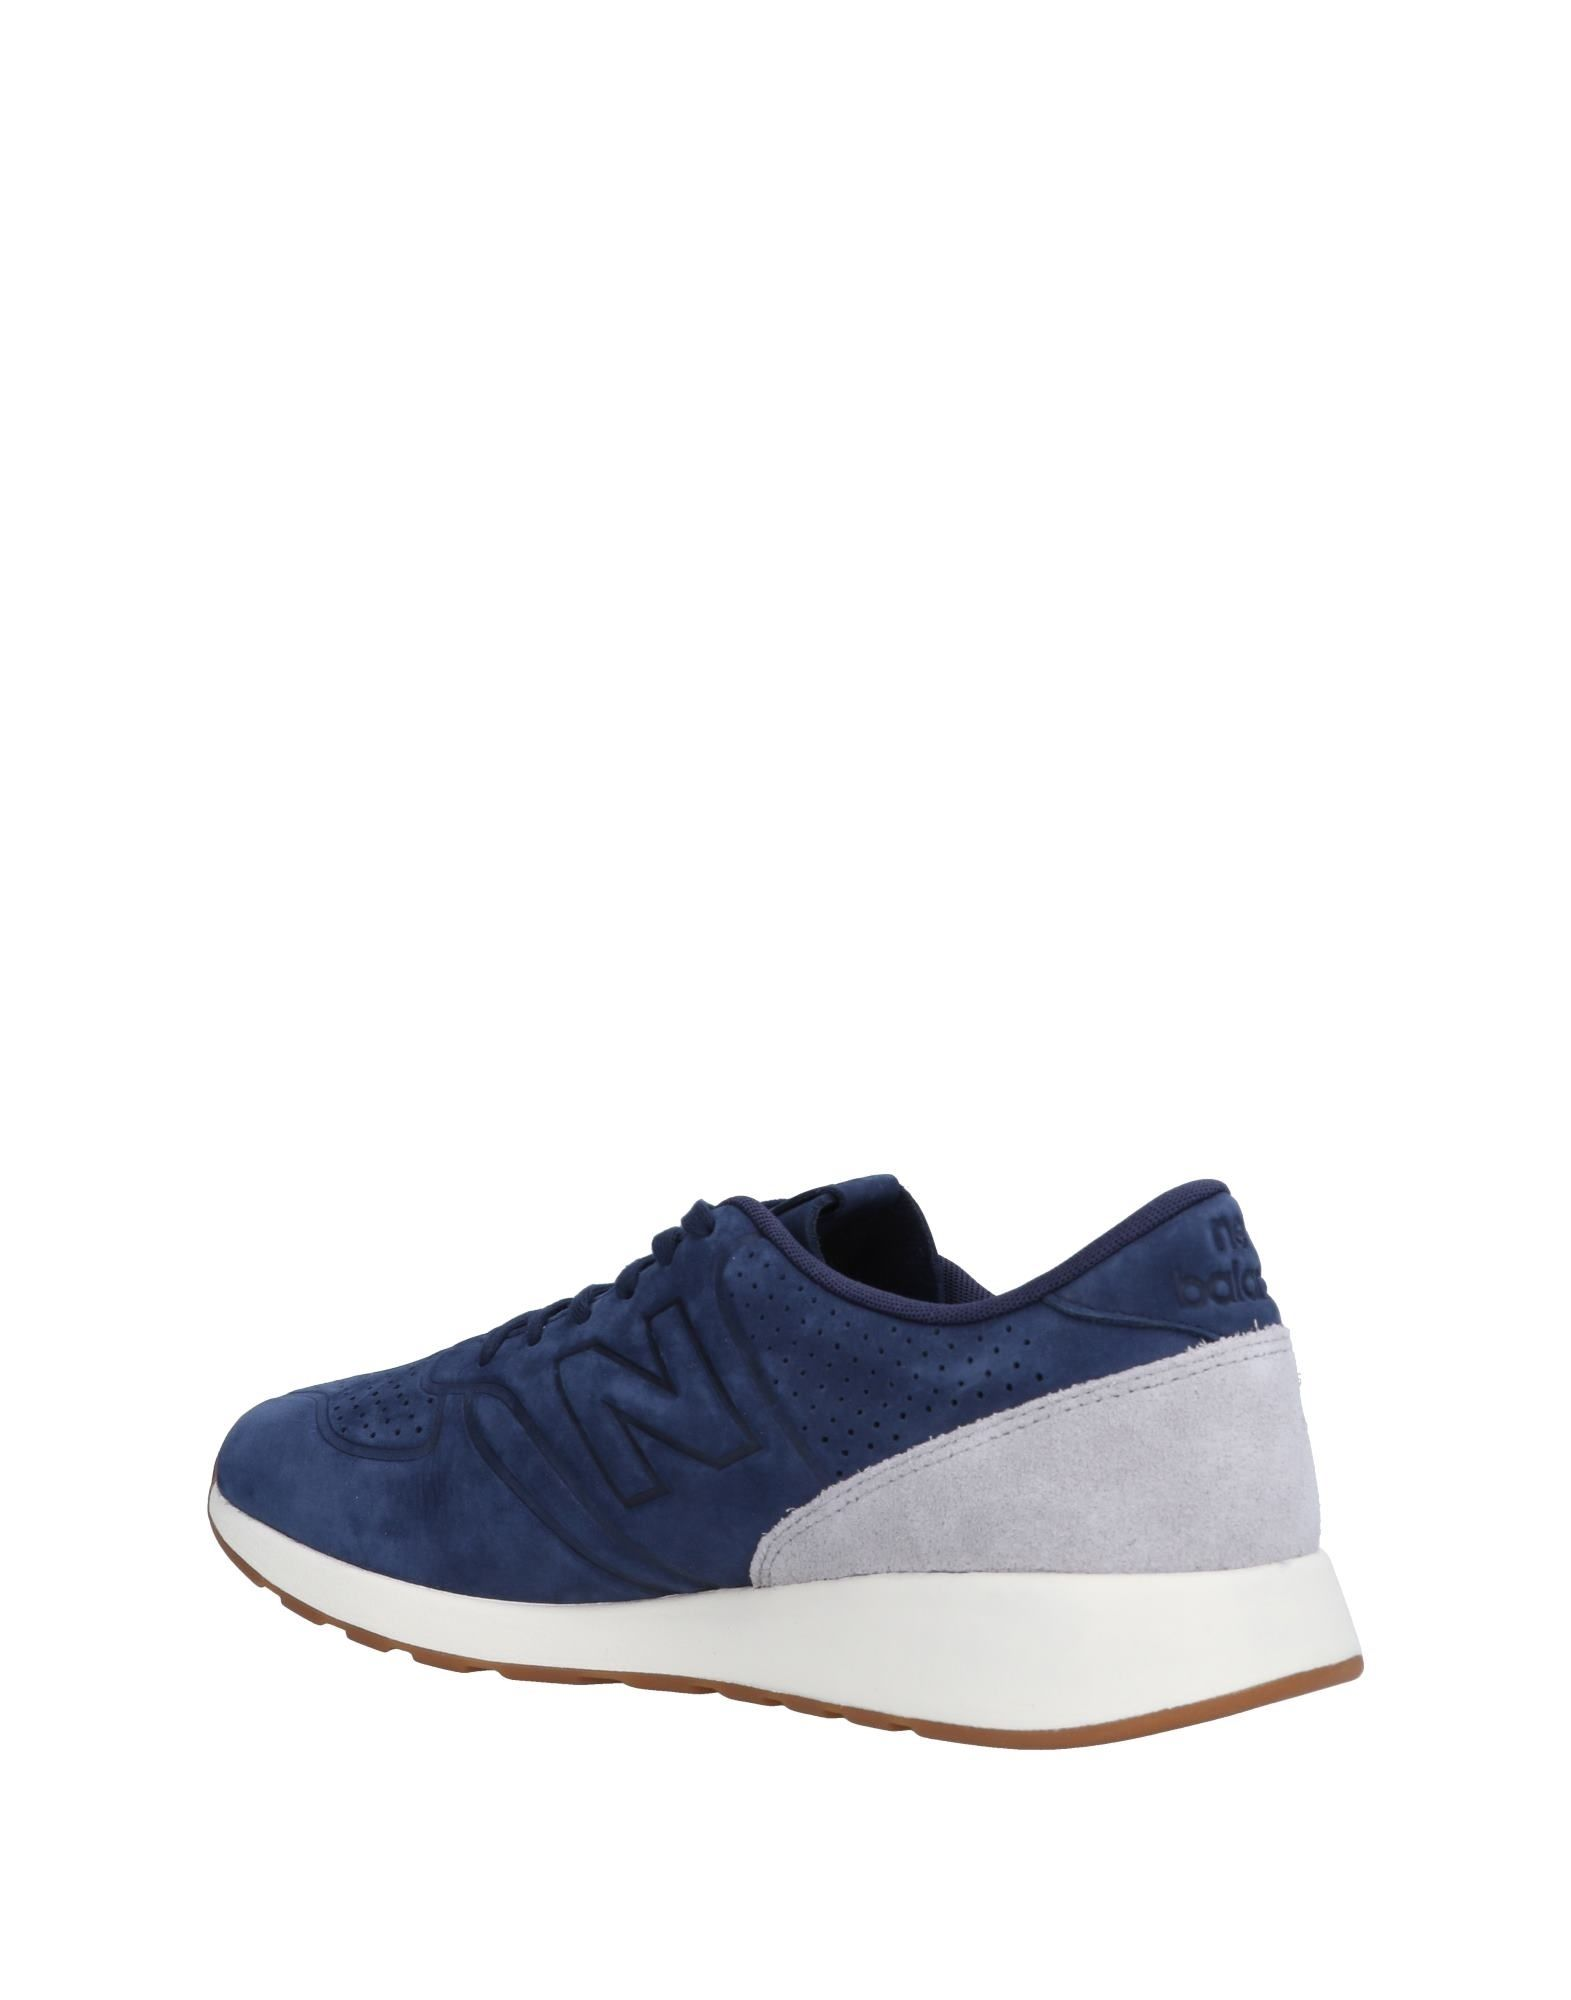 Rabatt Balance echte Schuhe New Balance Rabatt Sneakers Herren  11497715MH 05715d